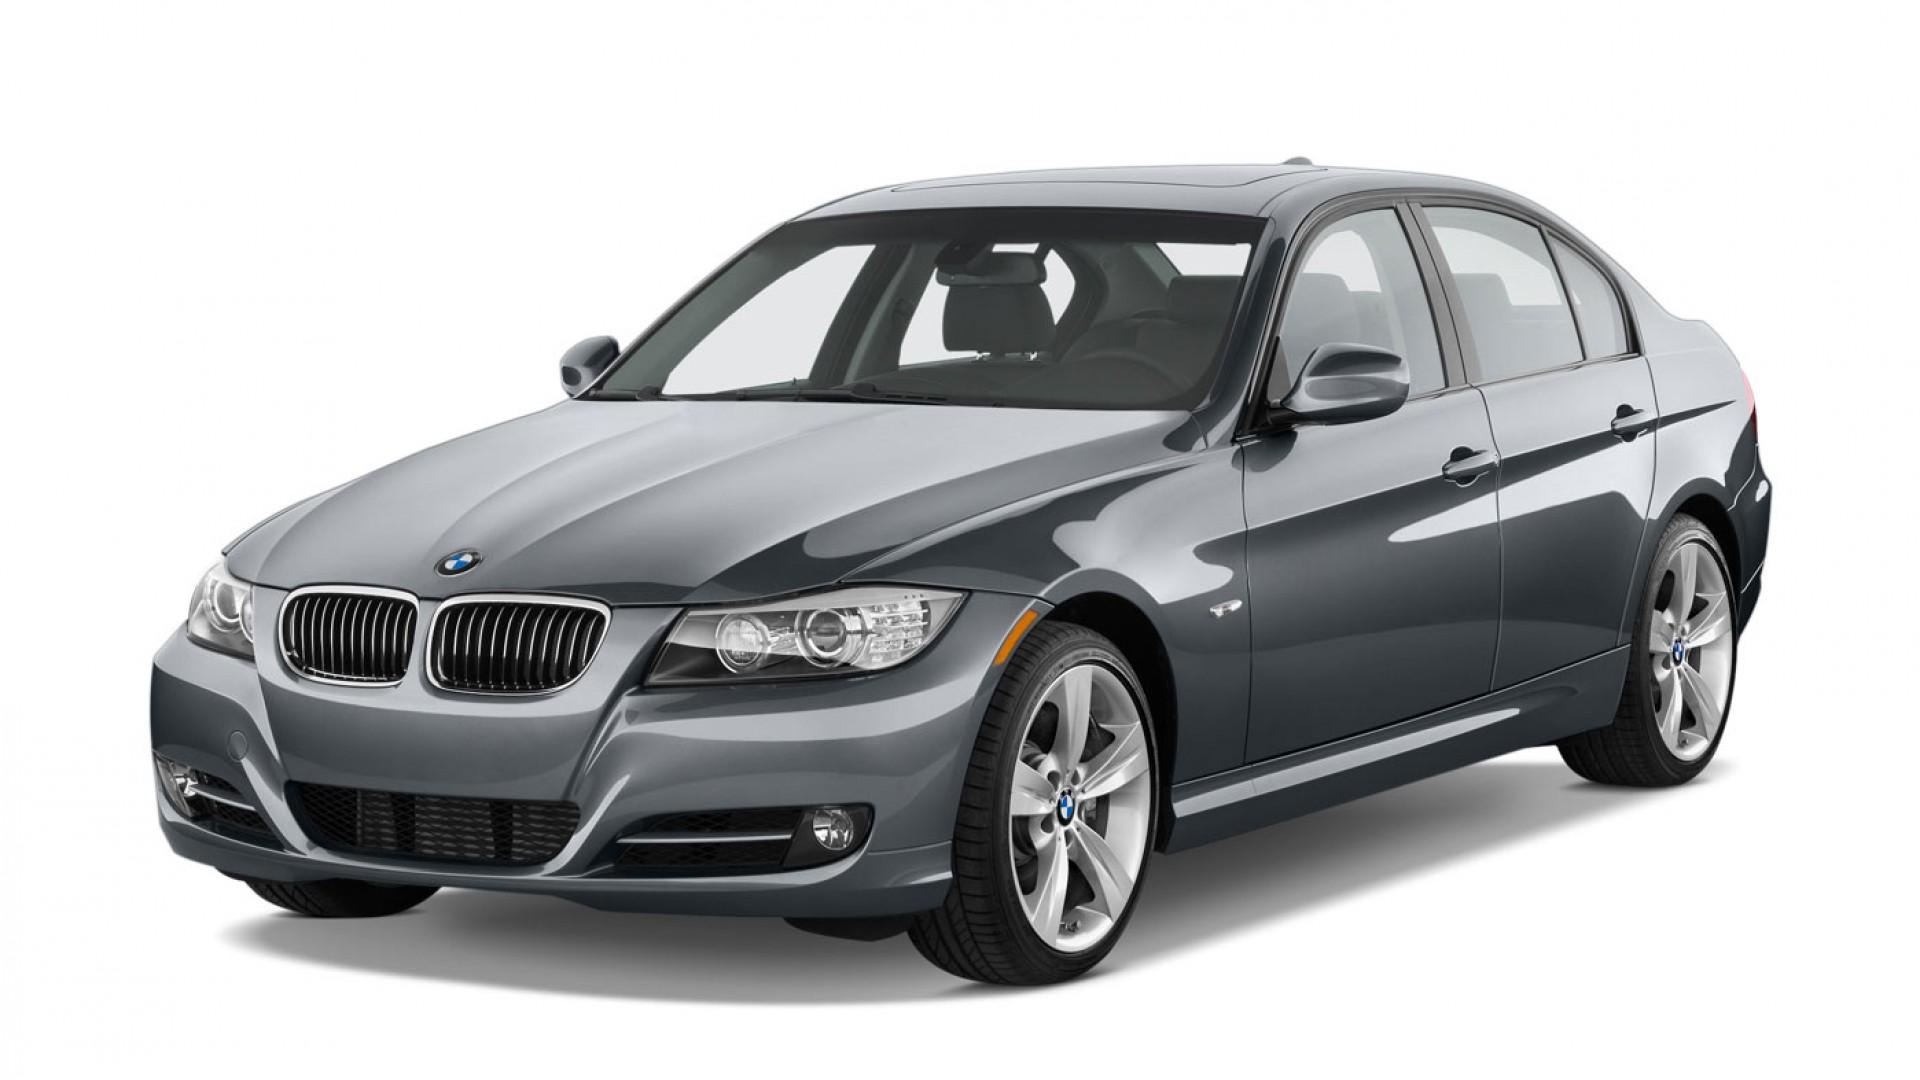 BMW E90 Service Repair Manuals PDF